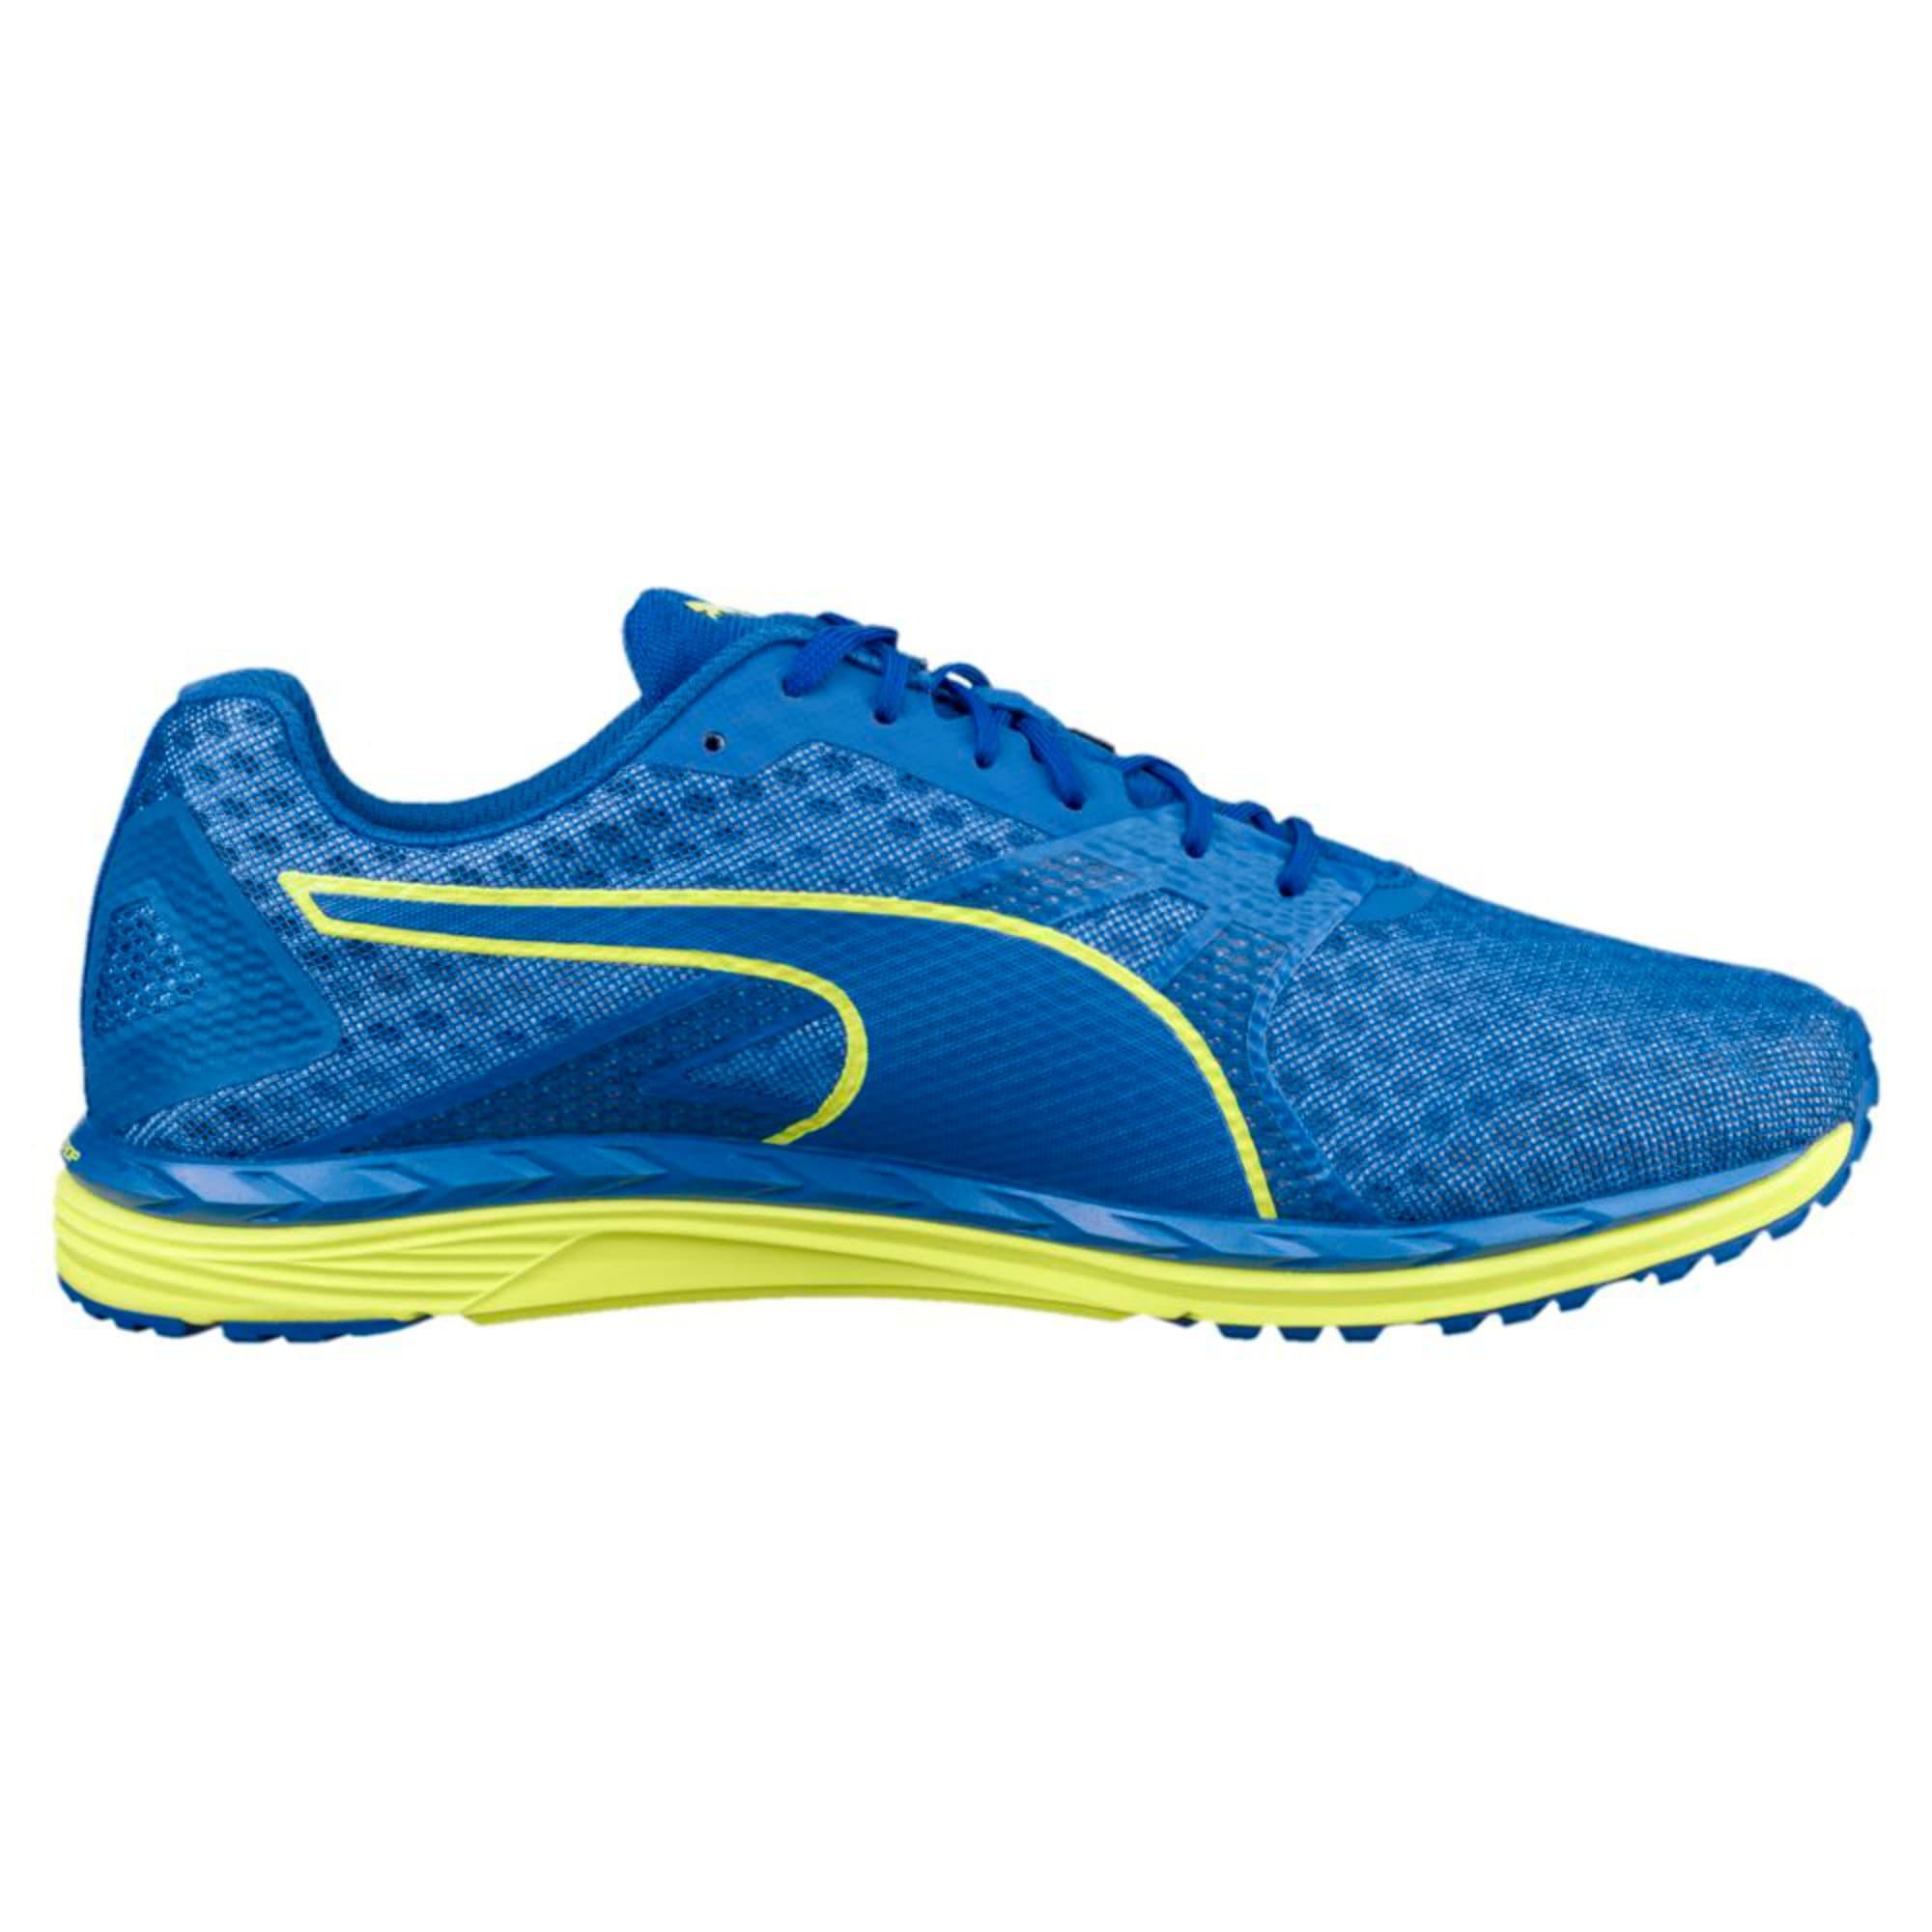 Thumbnail 2 of Speed 300 IGNITE 3 Men's Running Shoes, Turkish Sea-Peacoat-Yellow, medium-IND